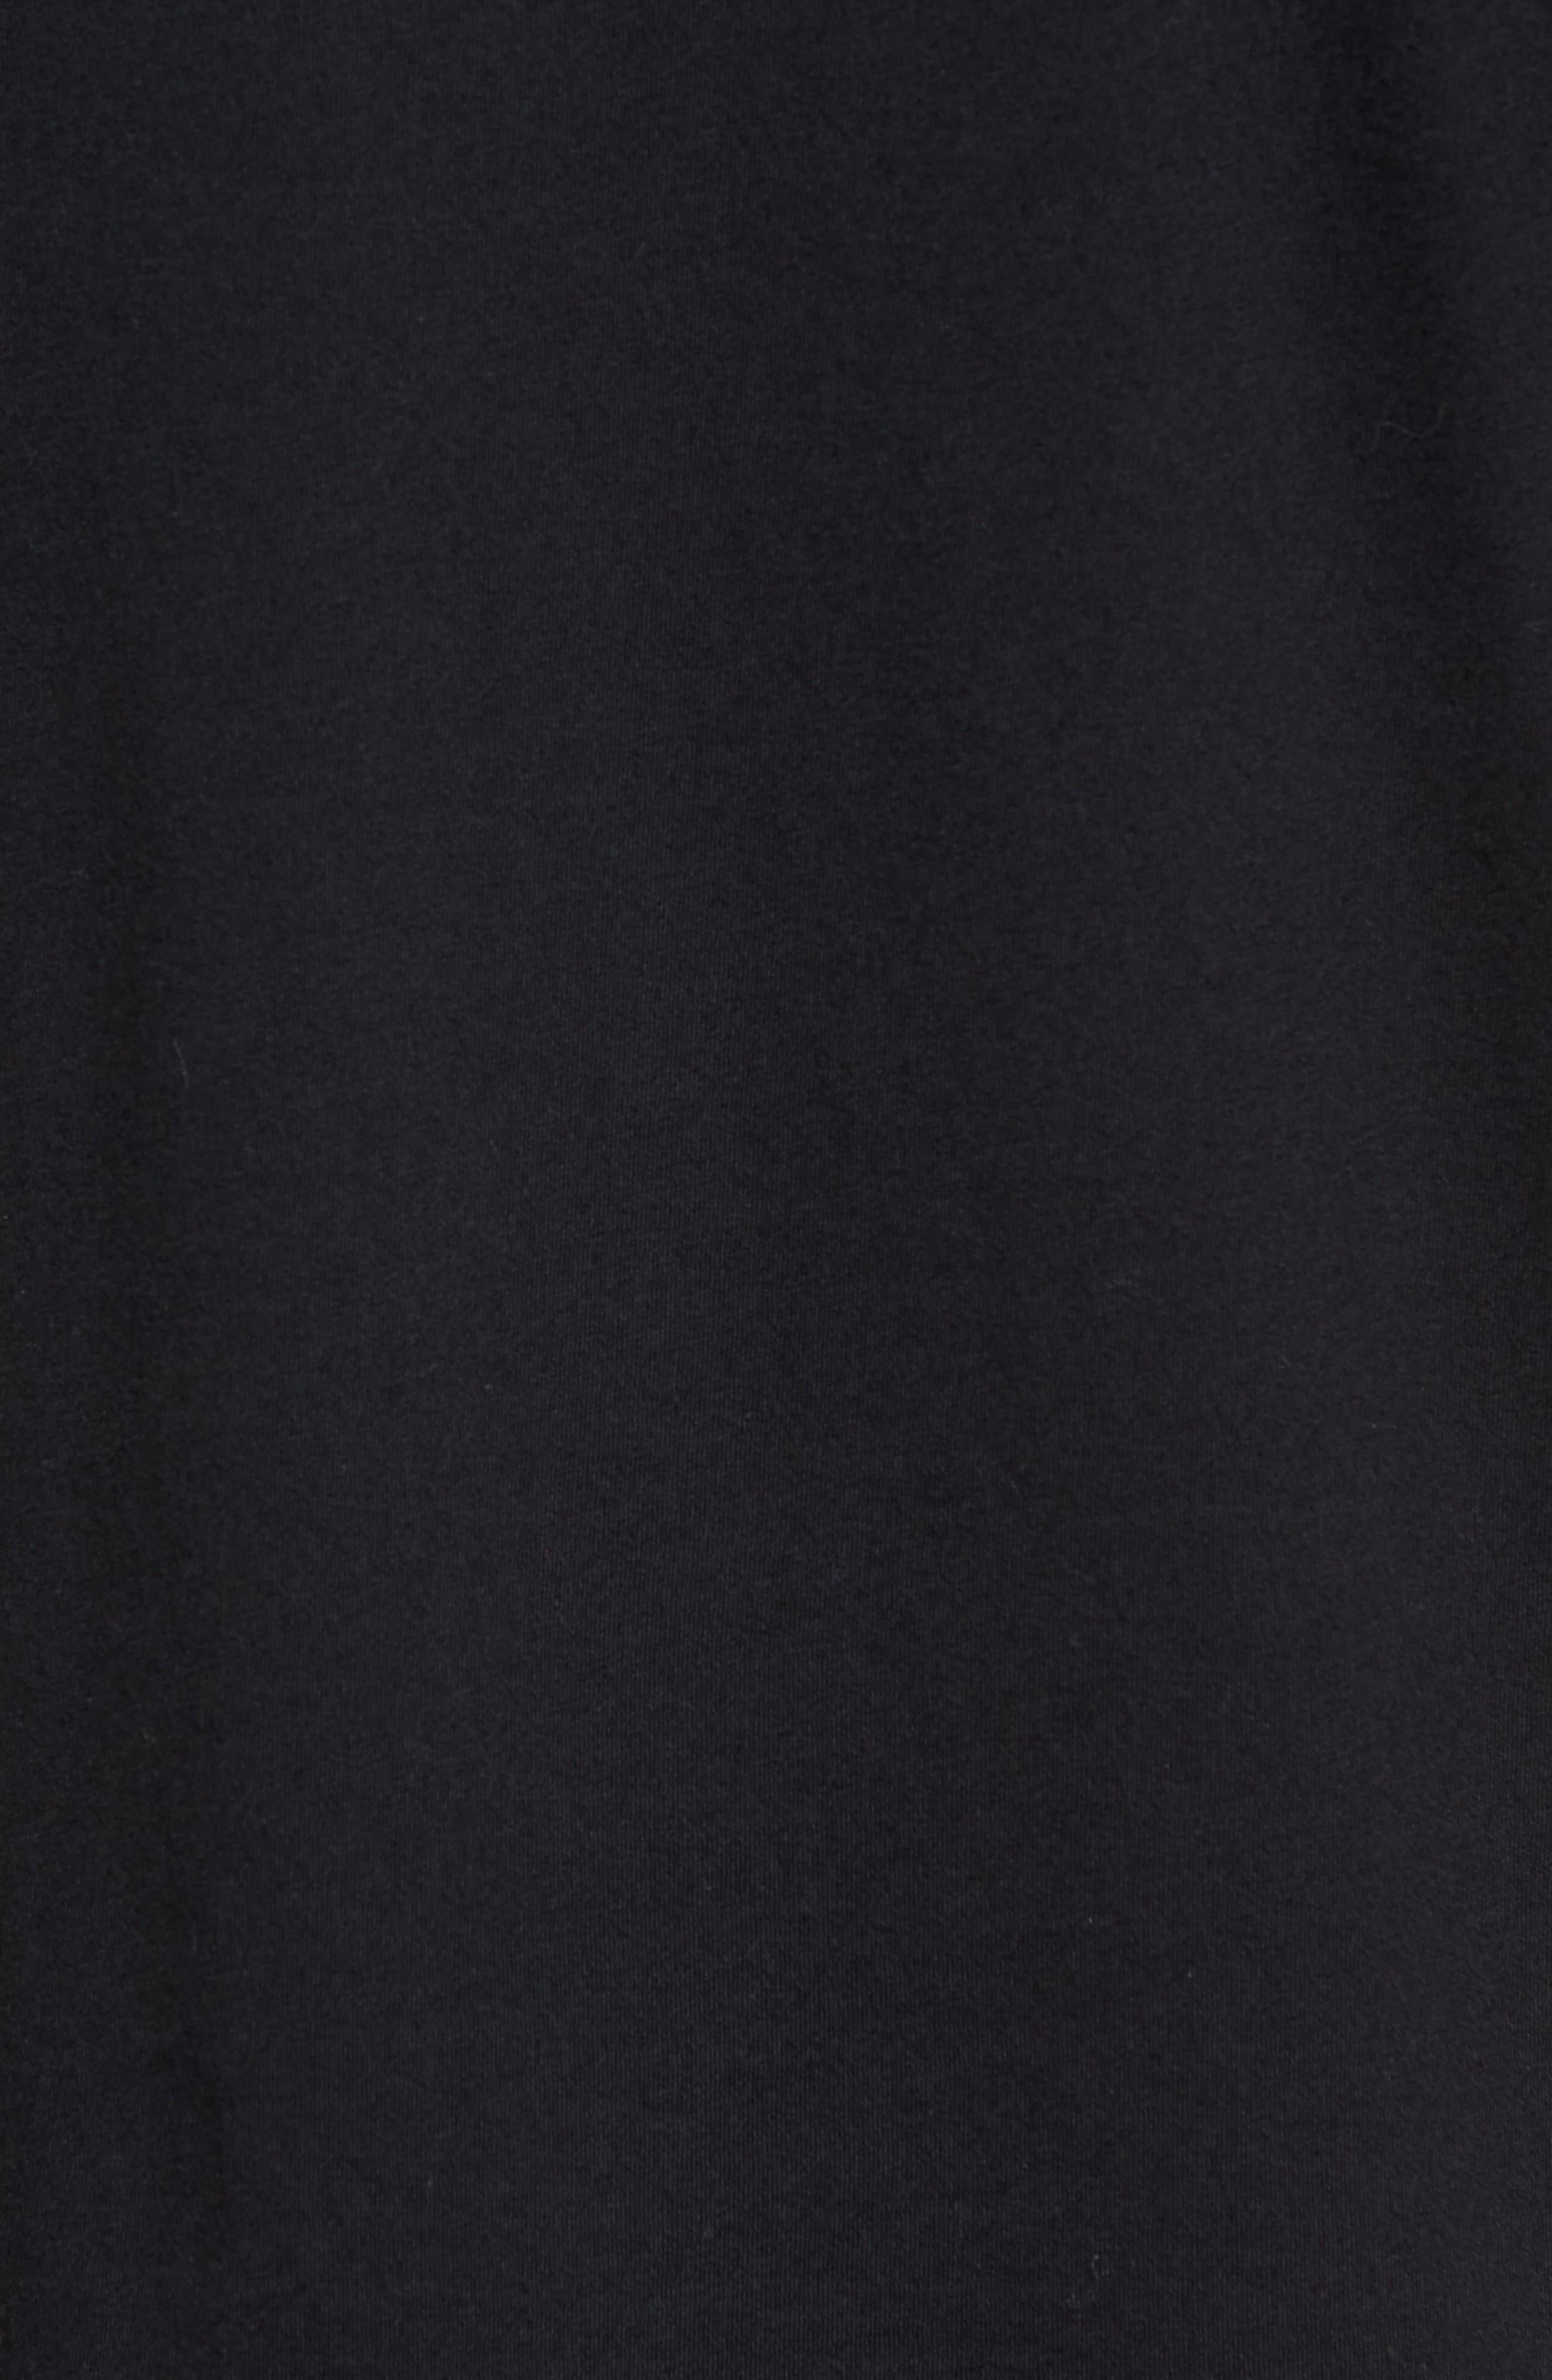 John Varvatos Guns N' Roses Graphic T-Shirt,                             Alternate thumbnail 6, color,                             Black